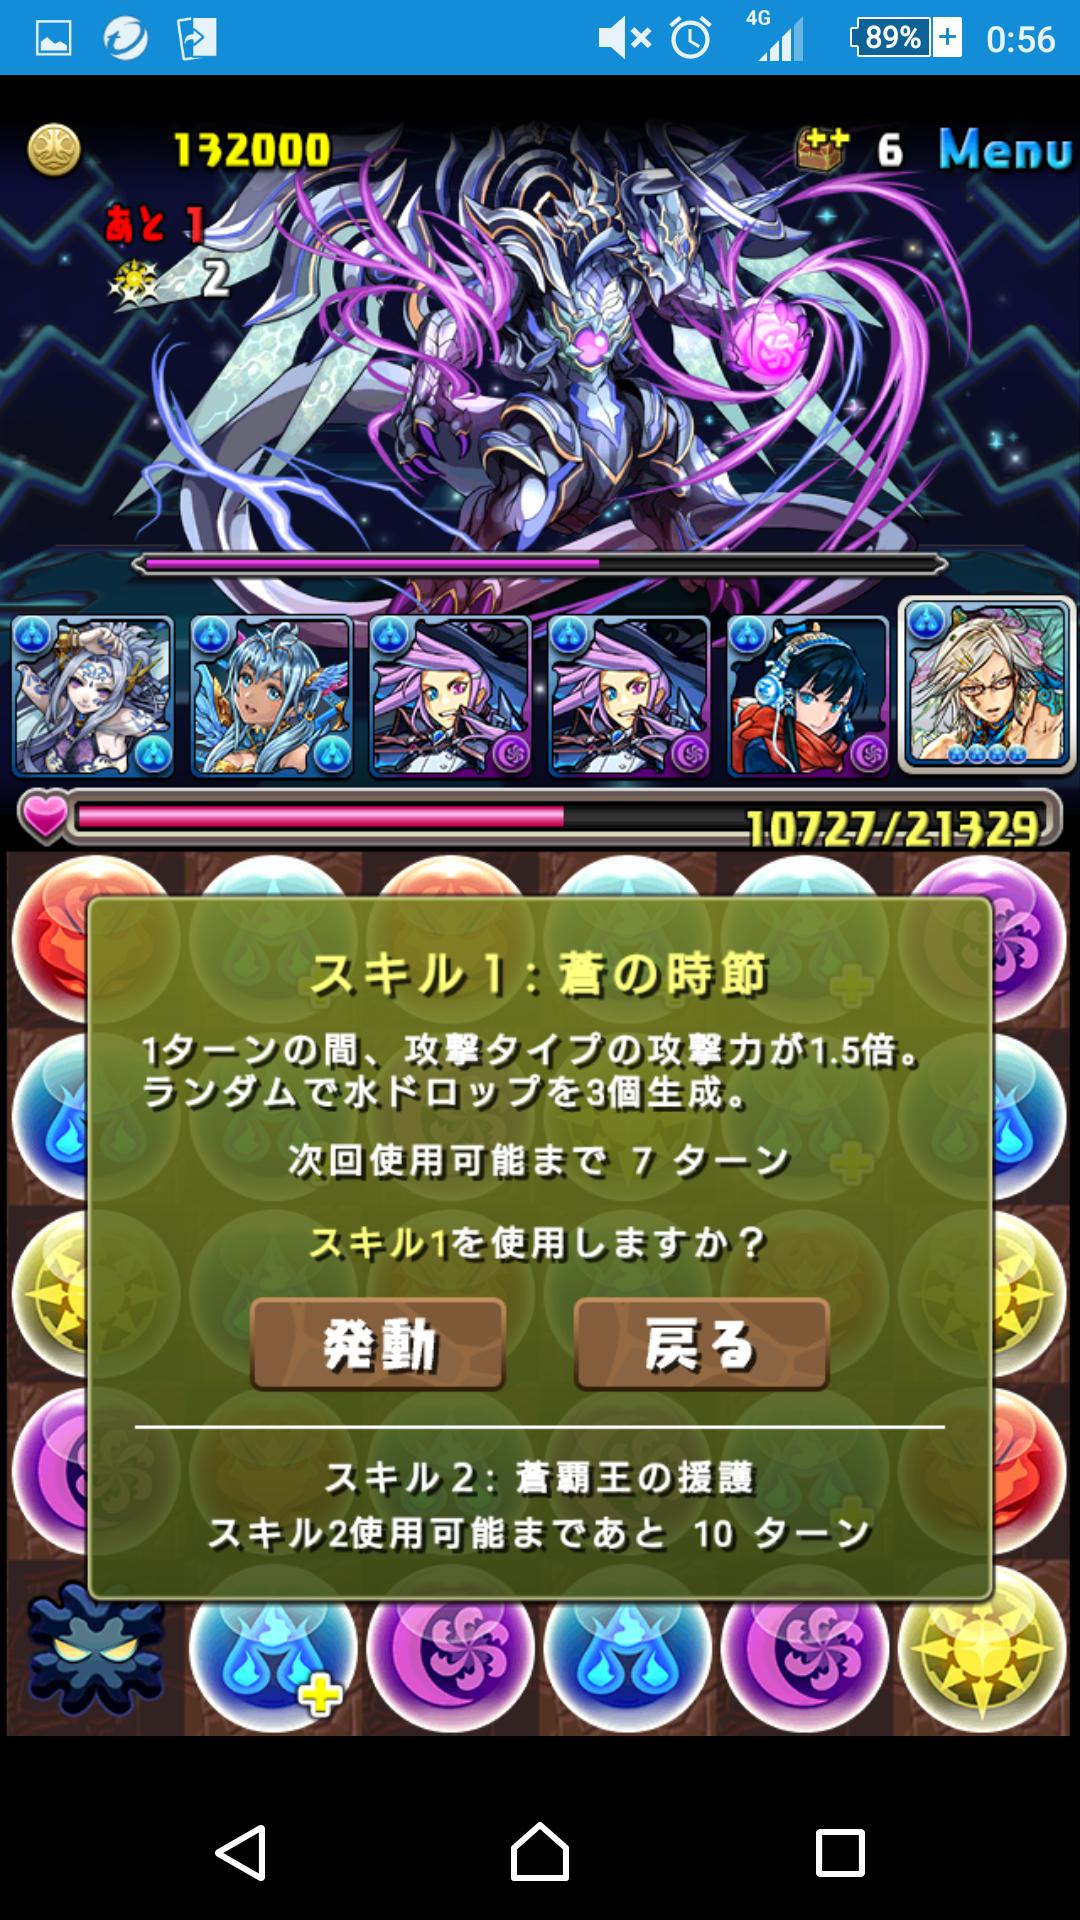 Screenshot_2016-05-16-00-56-52.png